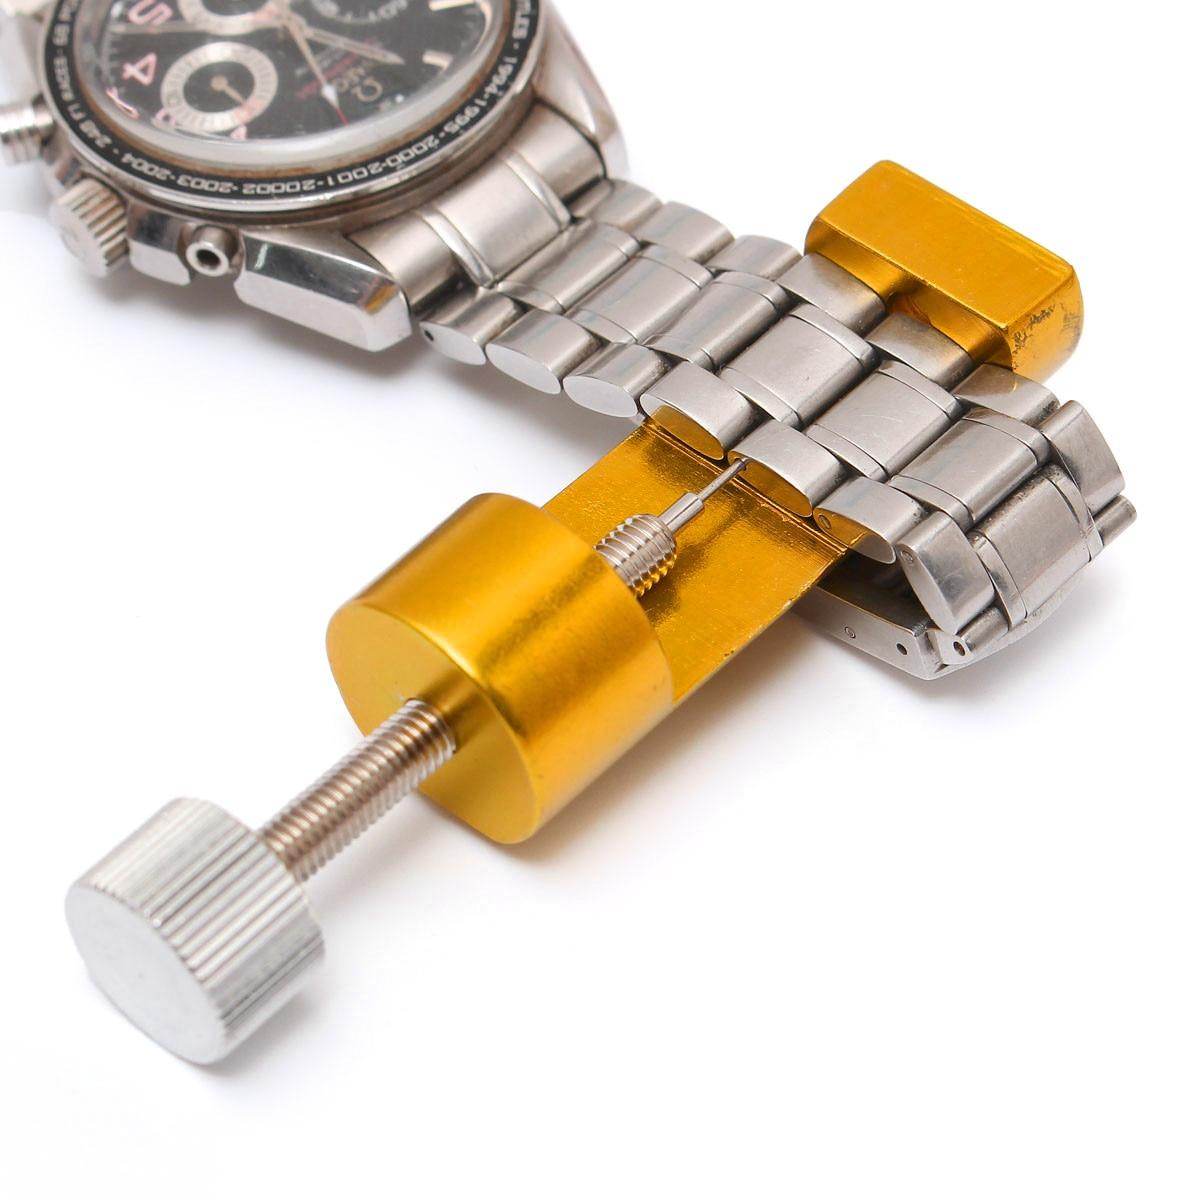 Watch Repair Tool Kit Golden Watch Tools Adjust Watch Bracelet Tool Watch Band Repair Link Pin Remover horloge gereedschap